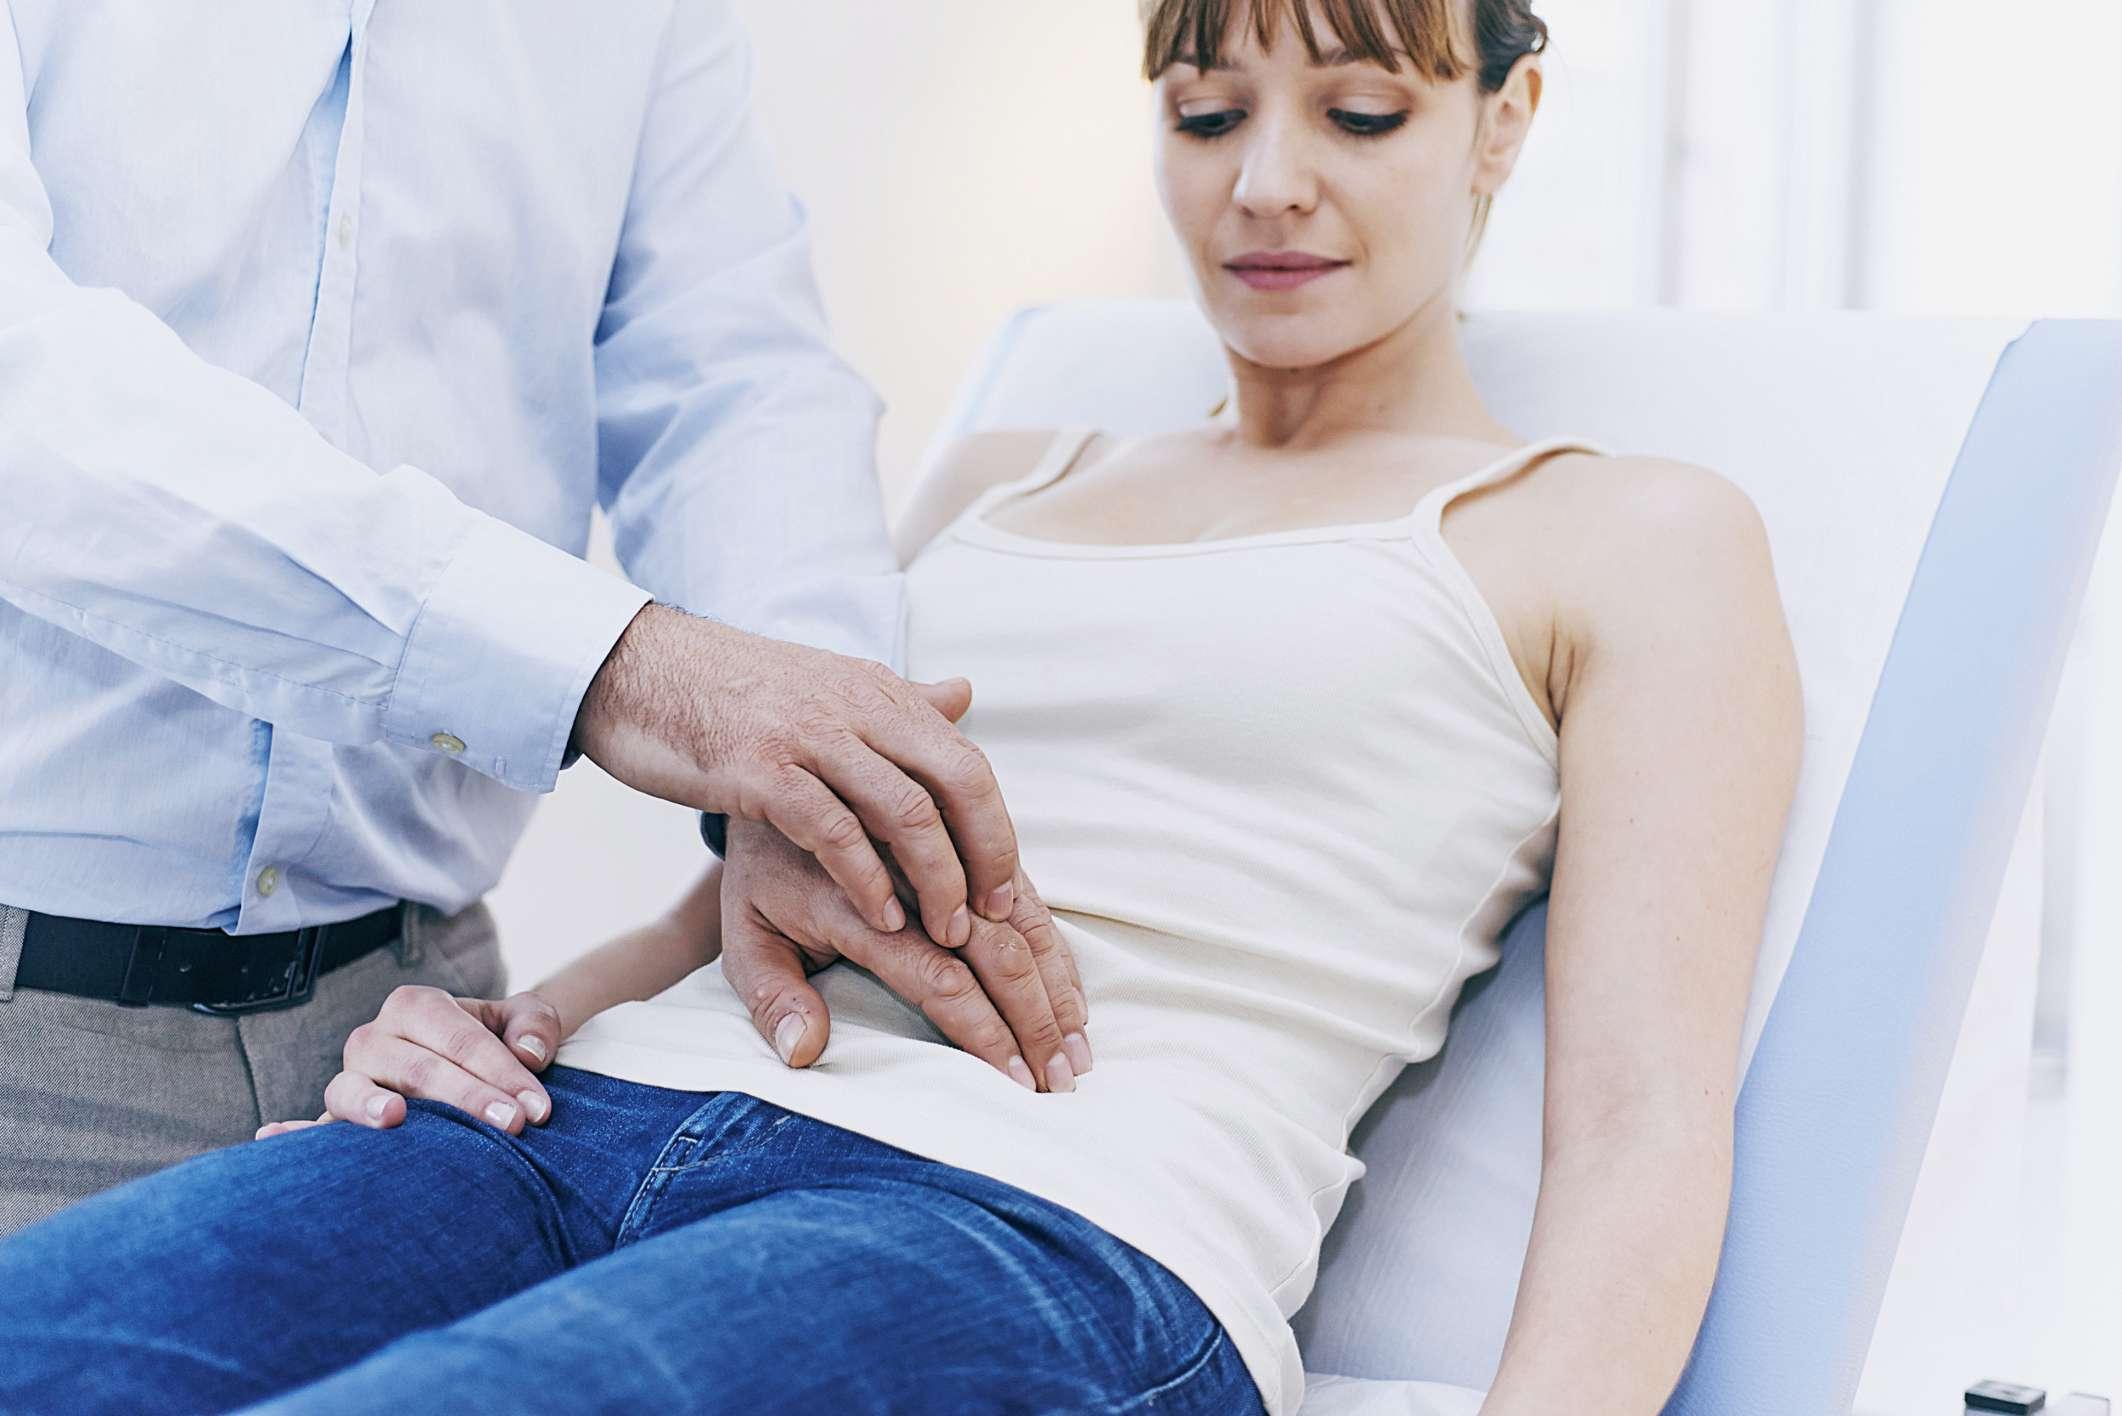 Gastroenterologist and patient